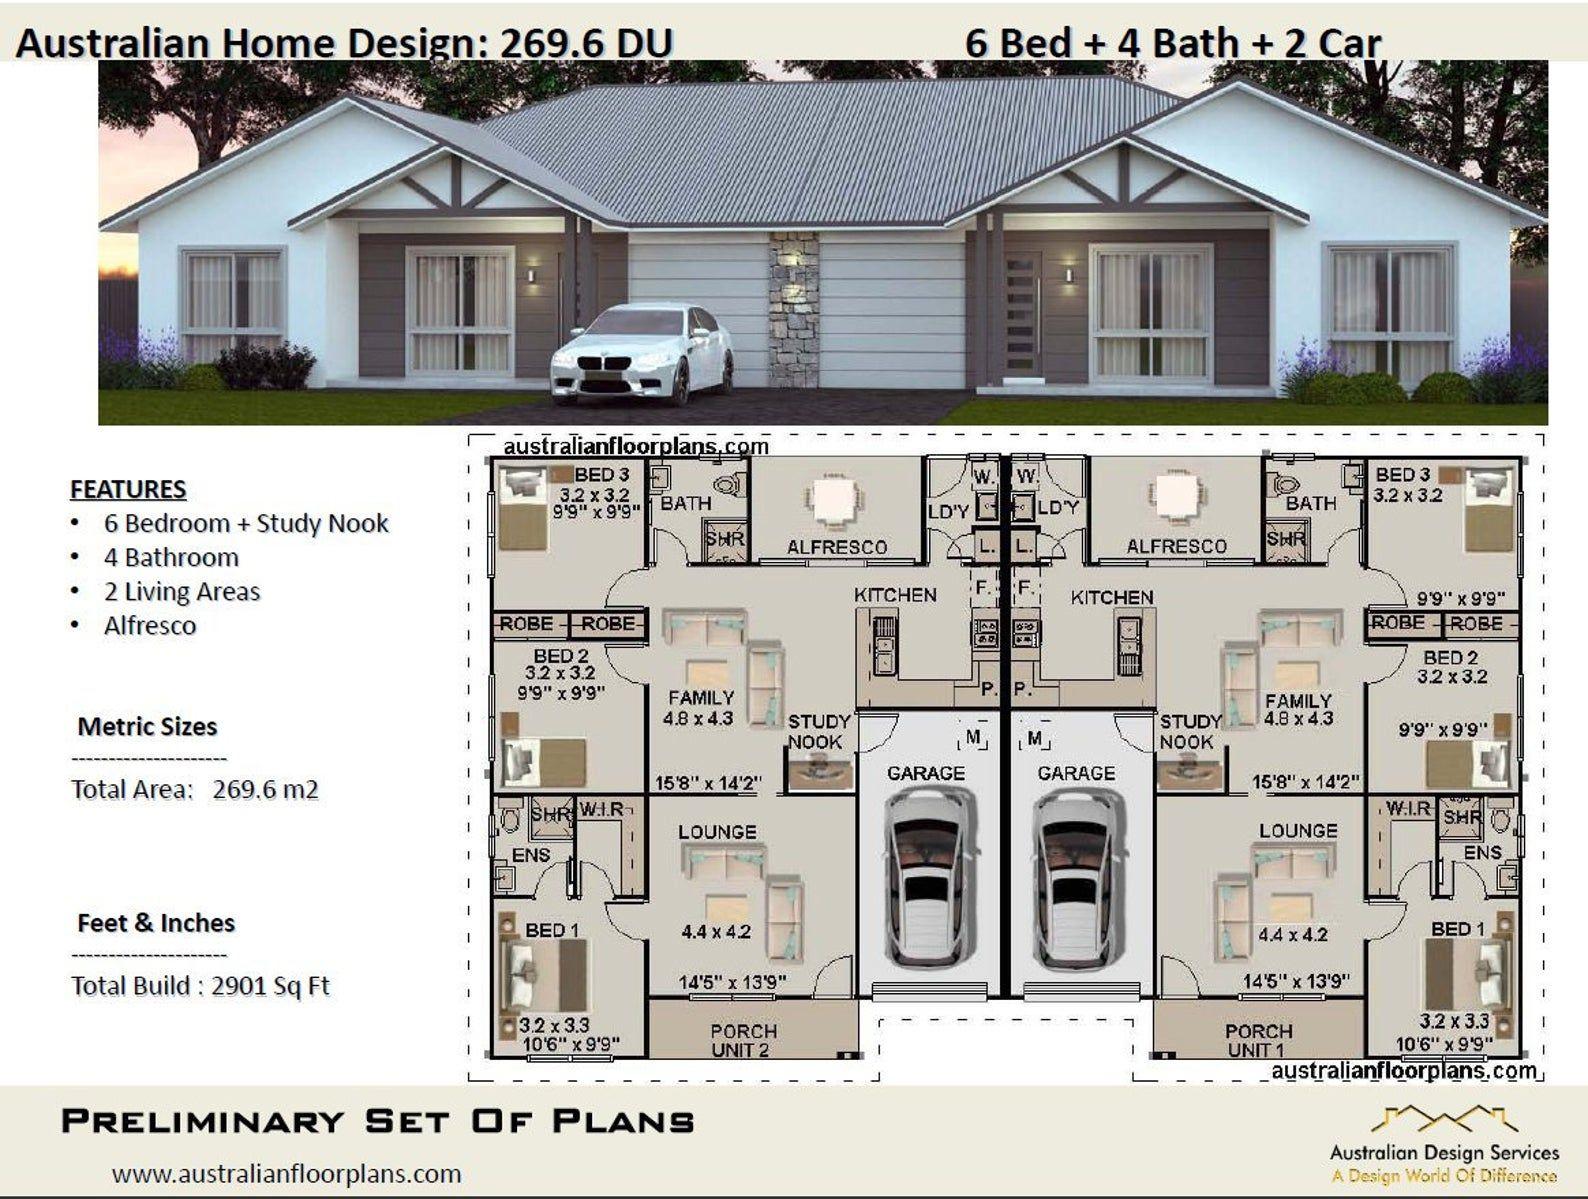 3222 Sq Feet 299 30 M2 Duplex House Plans 6 Bedrooms Etsy Duplex Design Duplex Floor Plans Duplex Plans